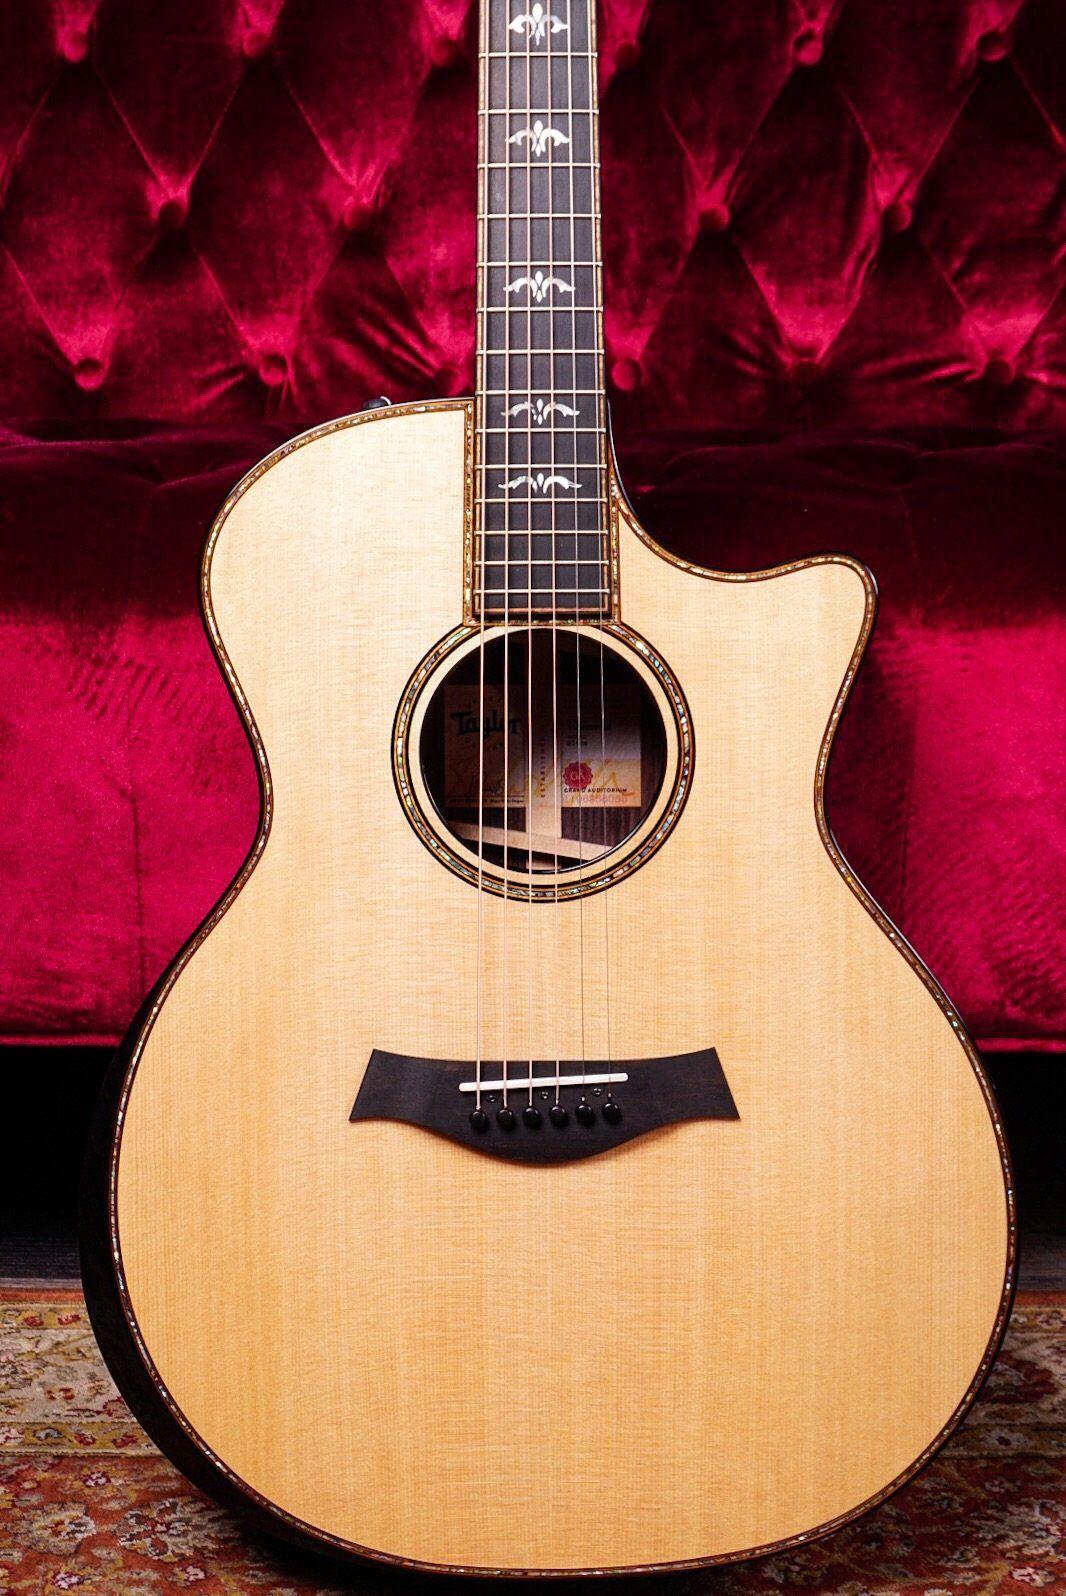 Taylor 914ce Grand Auditorium V-Class Electric Acoustic Guitar